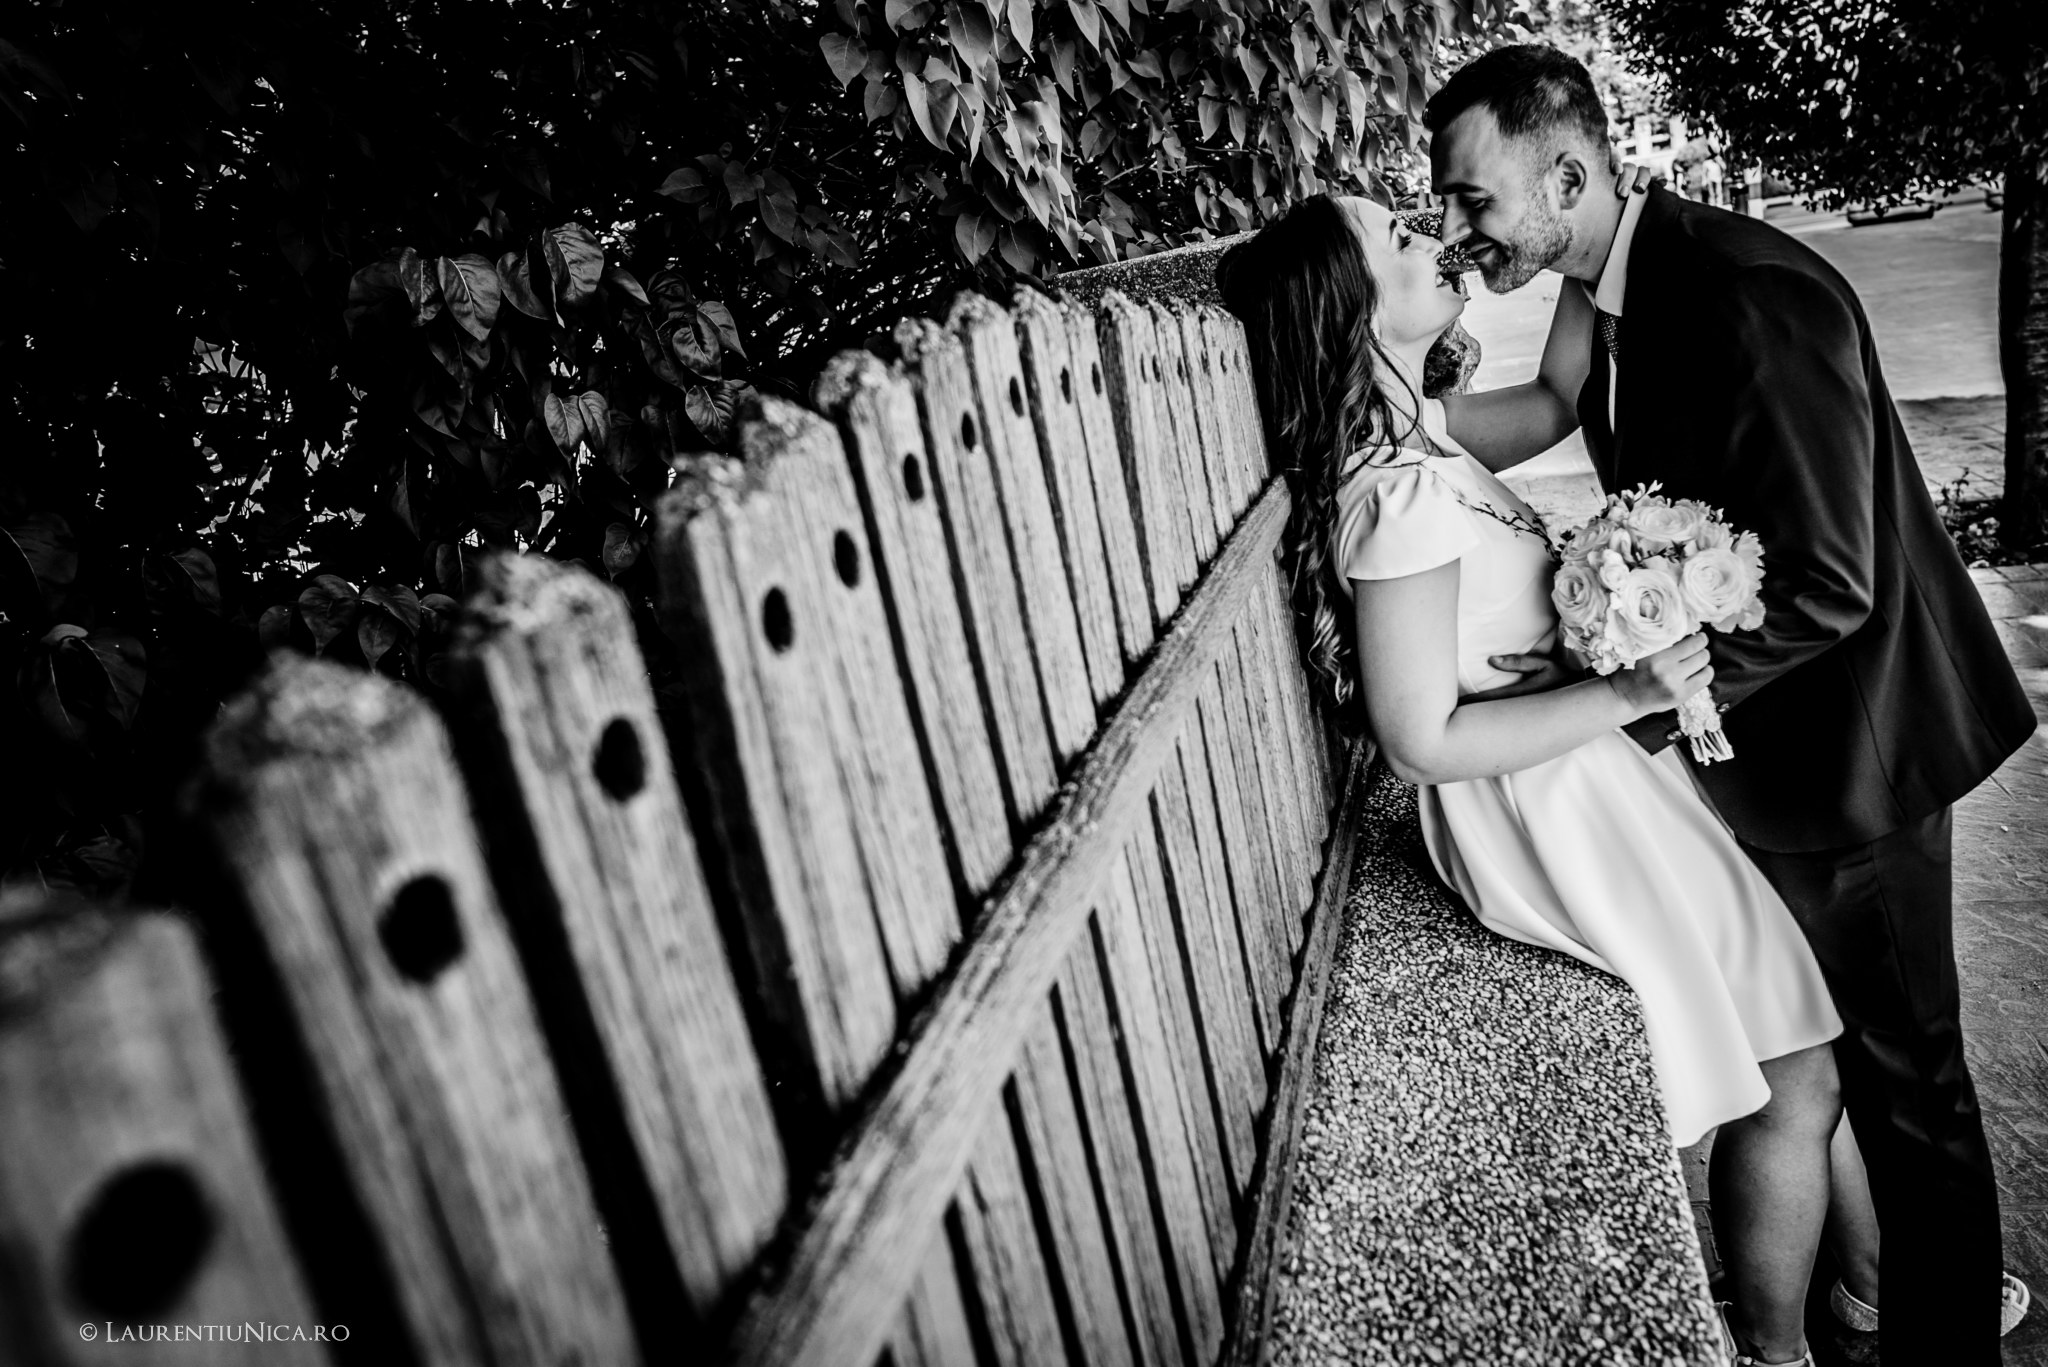 daiana si madalin fotograf nunta laurentiu nica targu jiu gorj 03 - Daiana & Madalin | Fotografii nunta | Targu-Jiu | Gorj